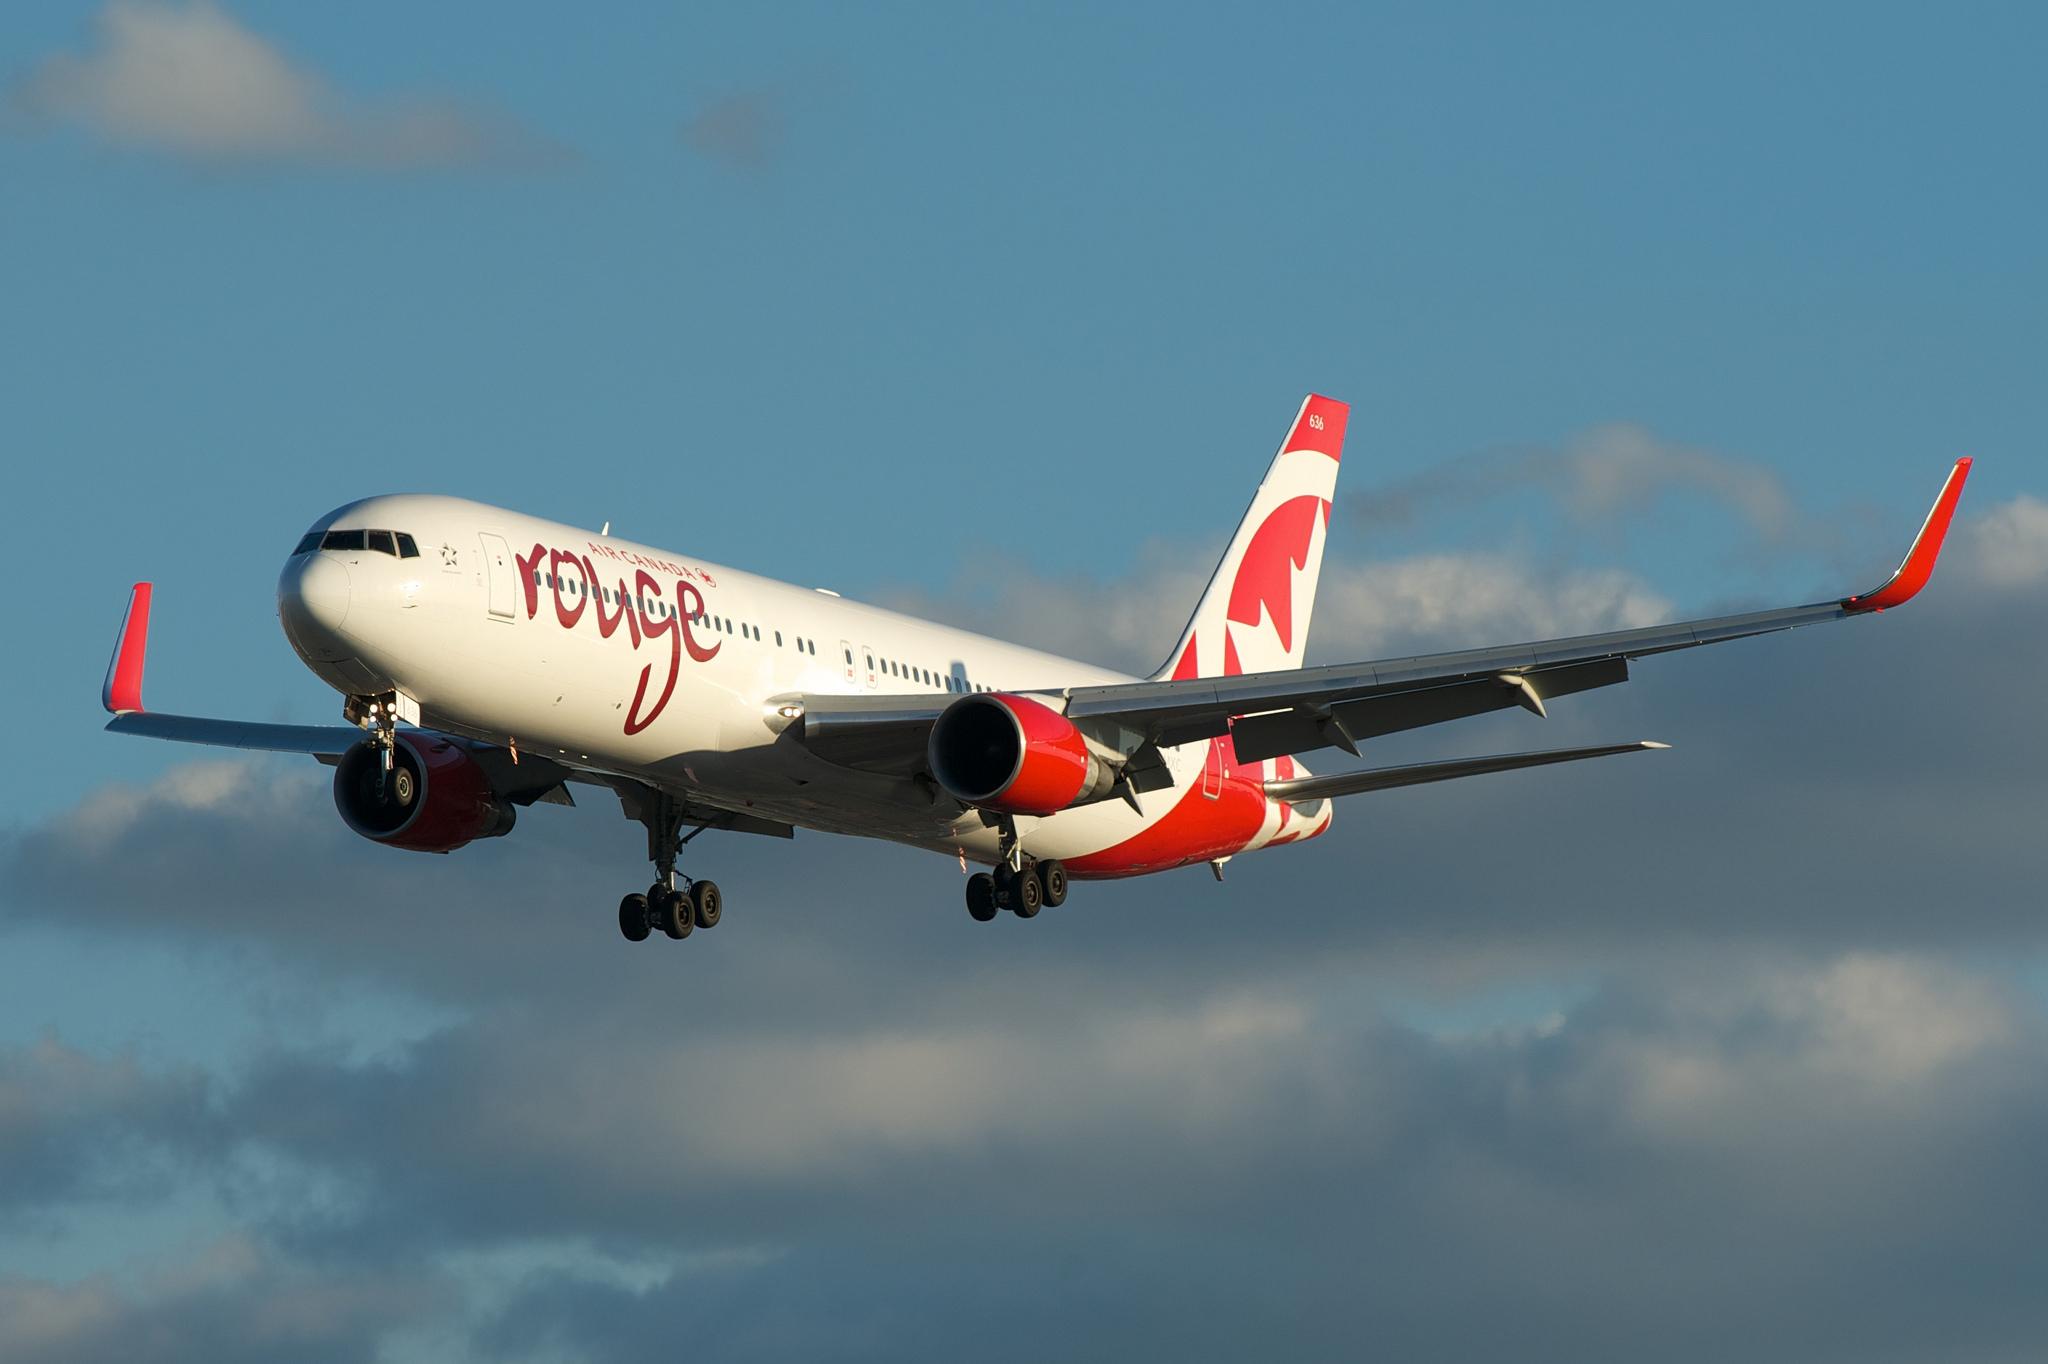 787-8 C-GHPQ (2) et Air Canada rouge Boeing 767-300 C-FMXC par BriYYZ sous (CC BY-SA 2.0)